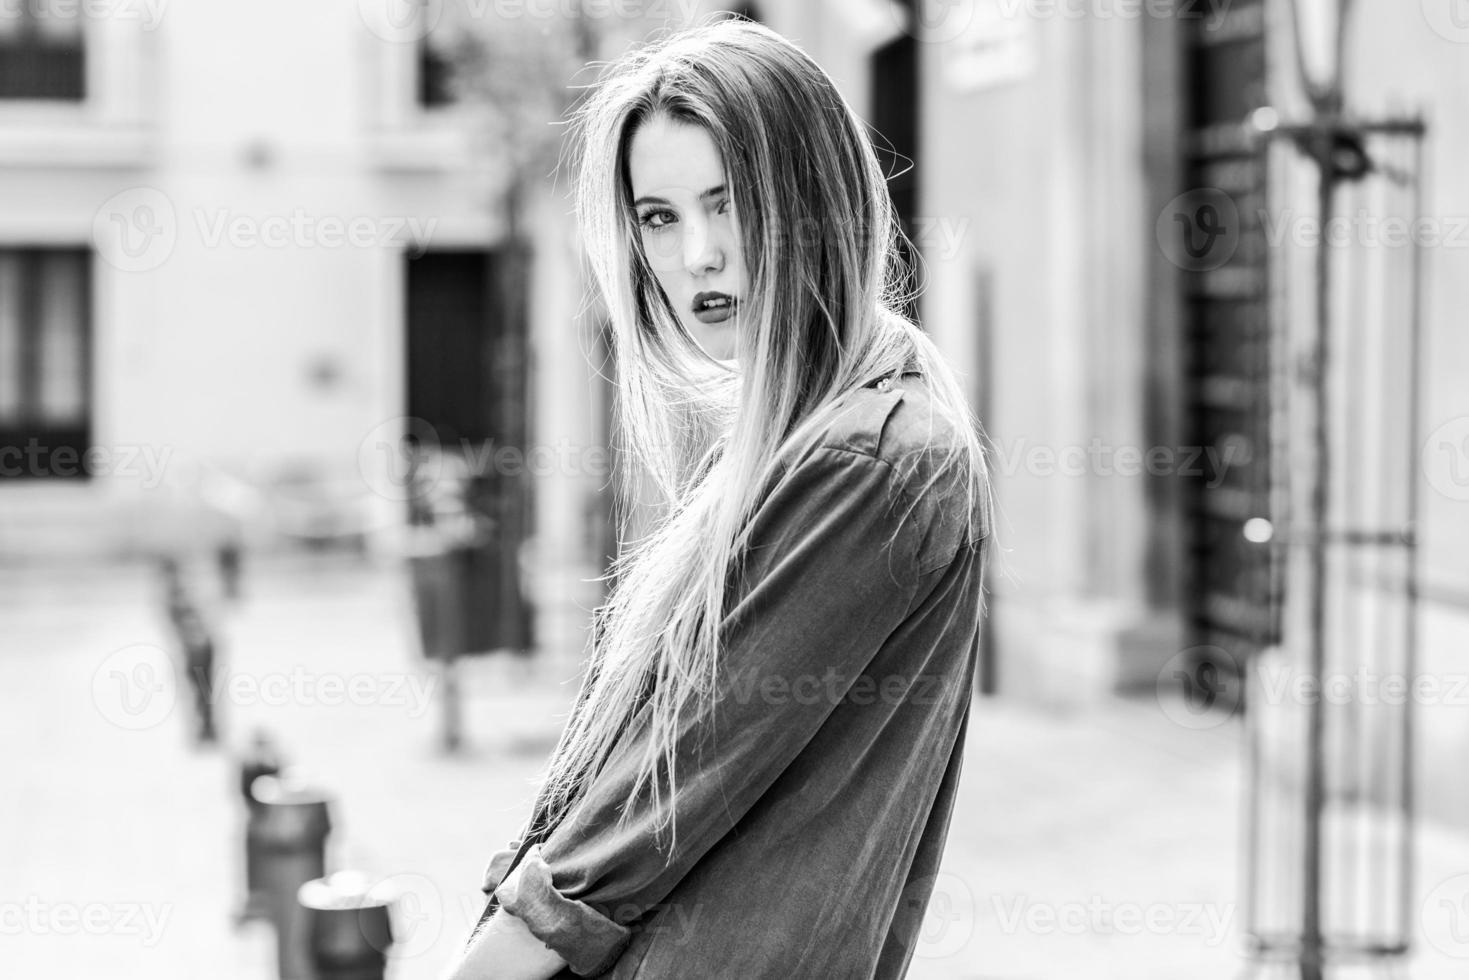 fond urbain fille blonde photo